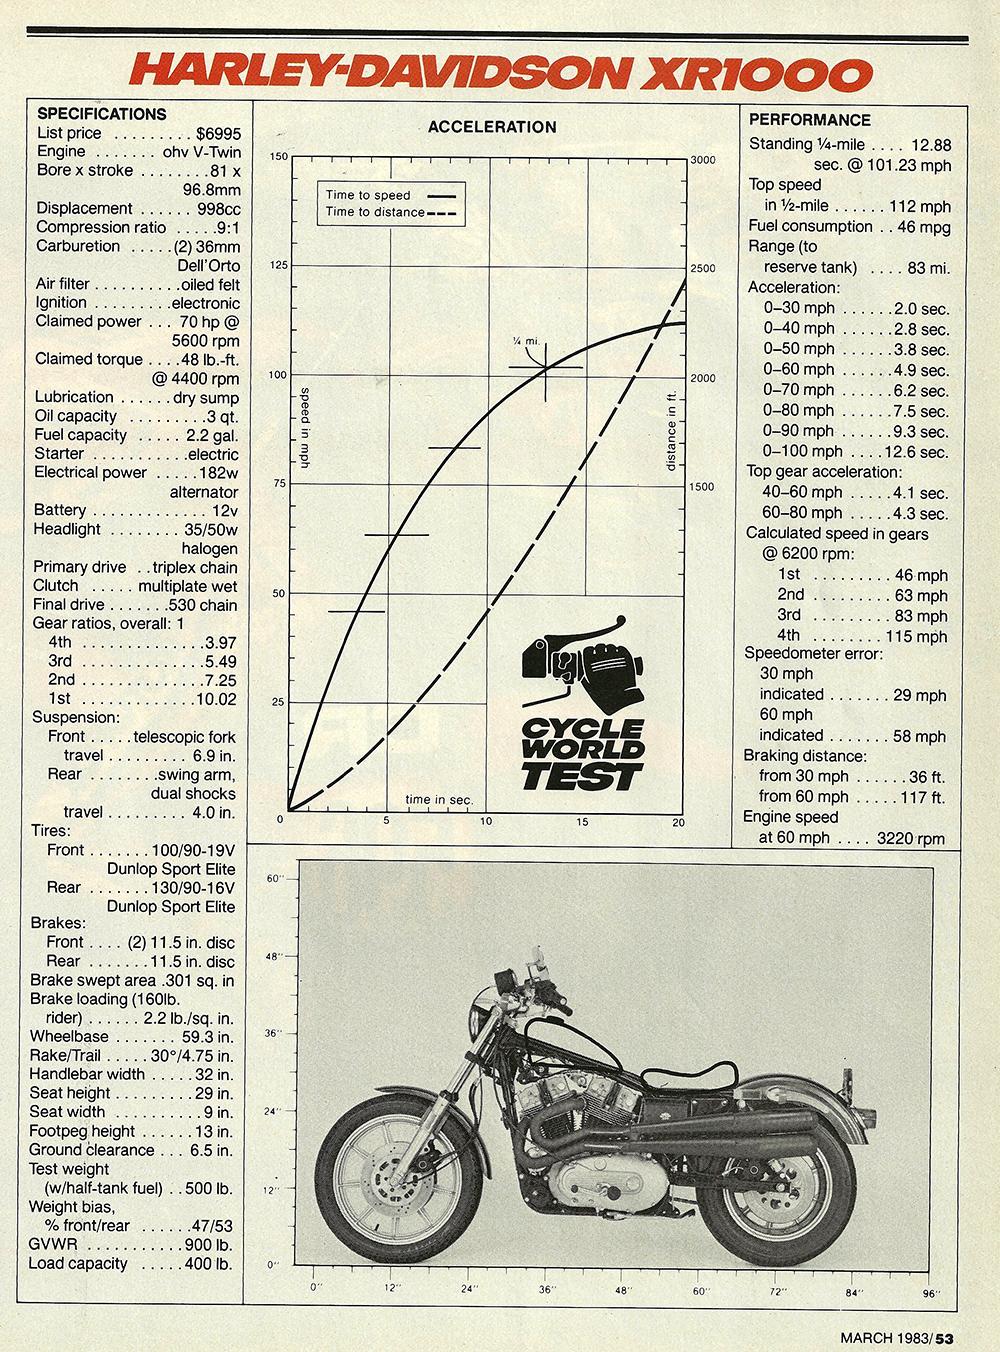 1983 Harley-Davidson XR1000 road test 08.jpg